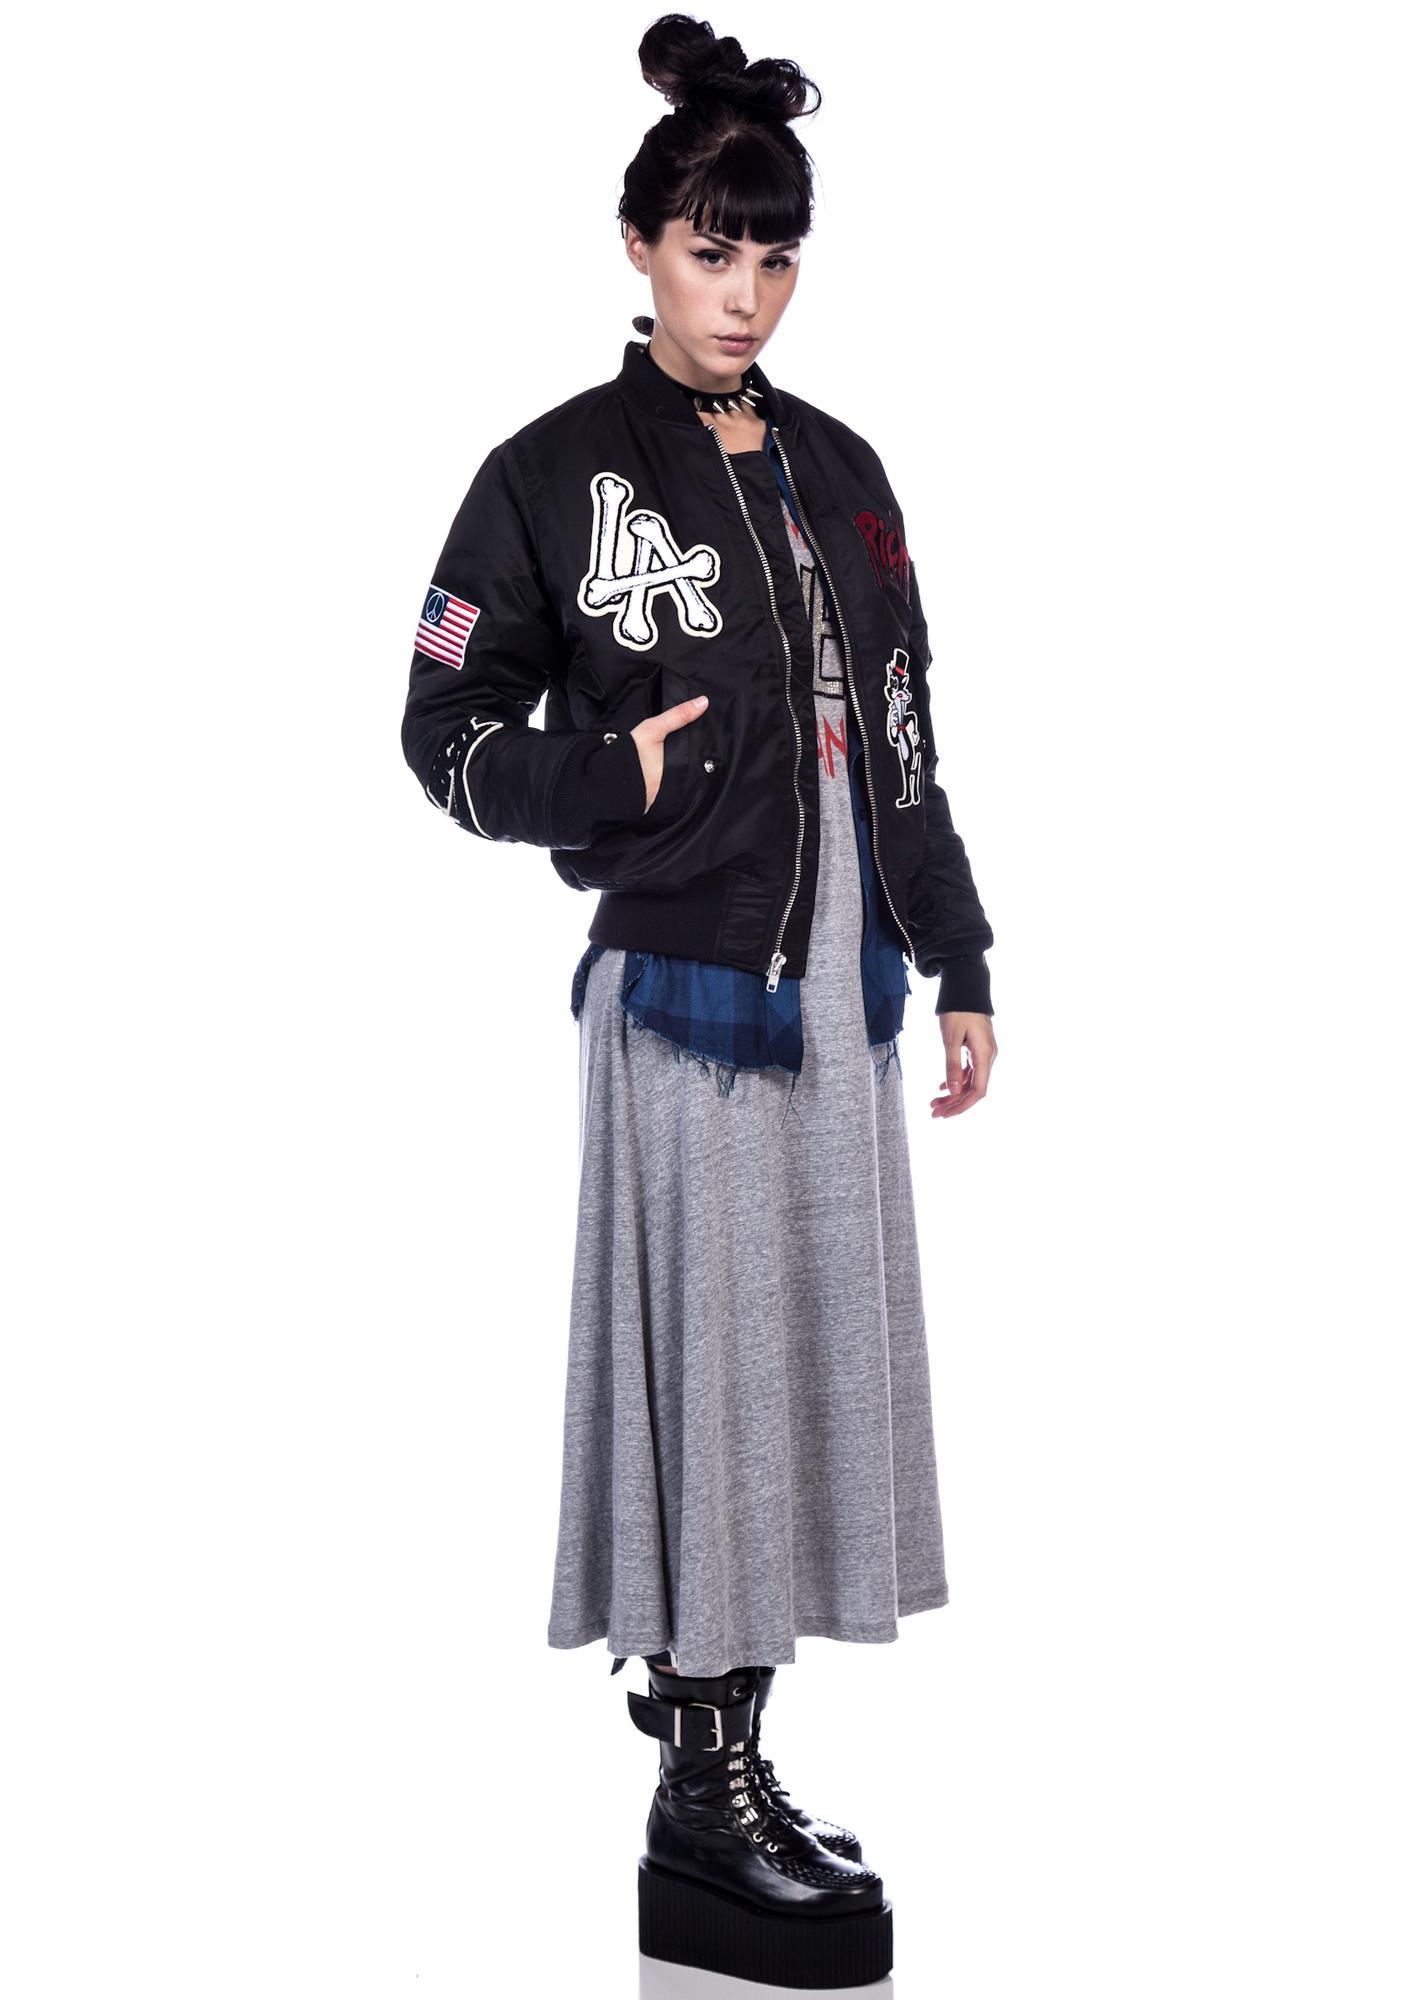 Joyrich Outdoor Patch Jacket